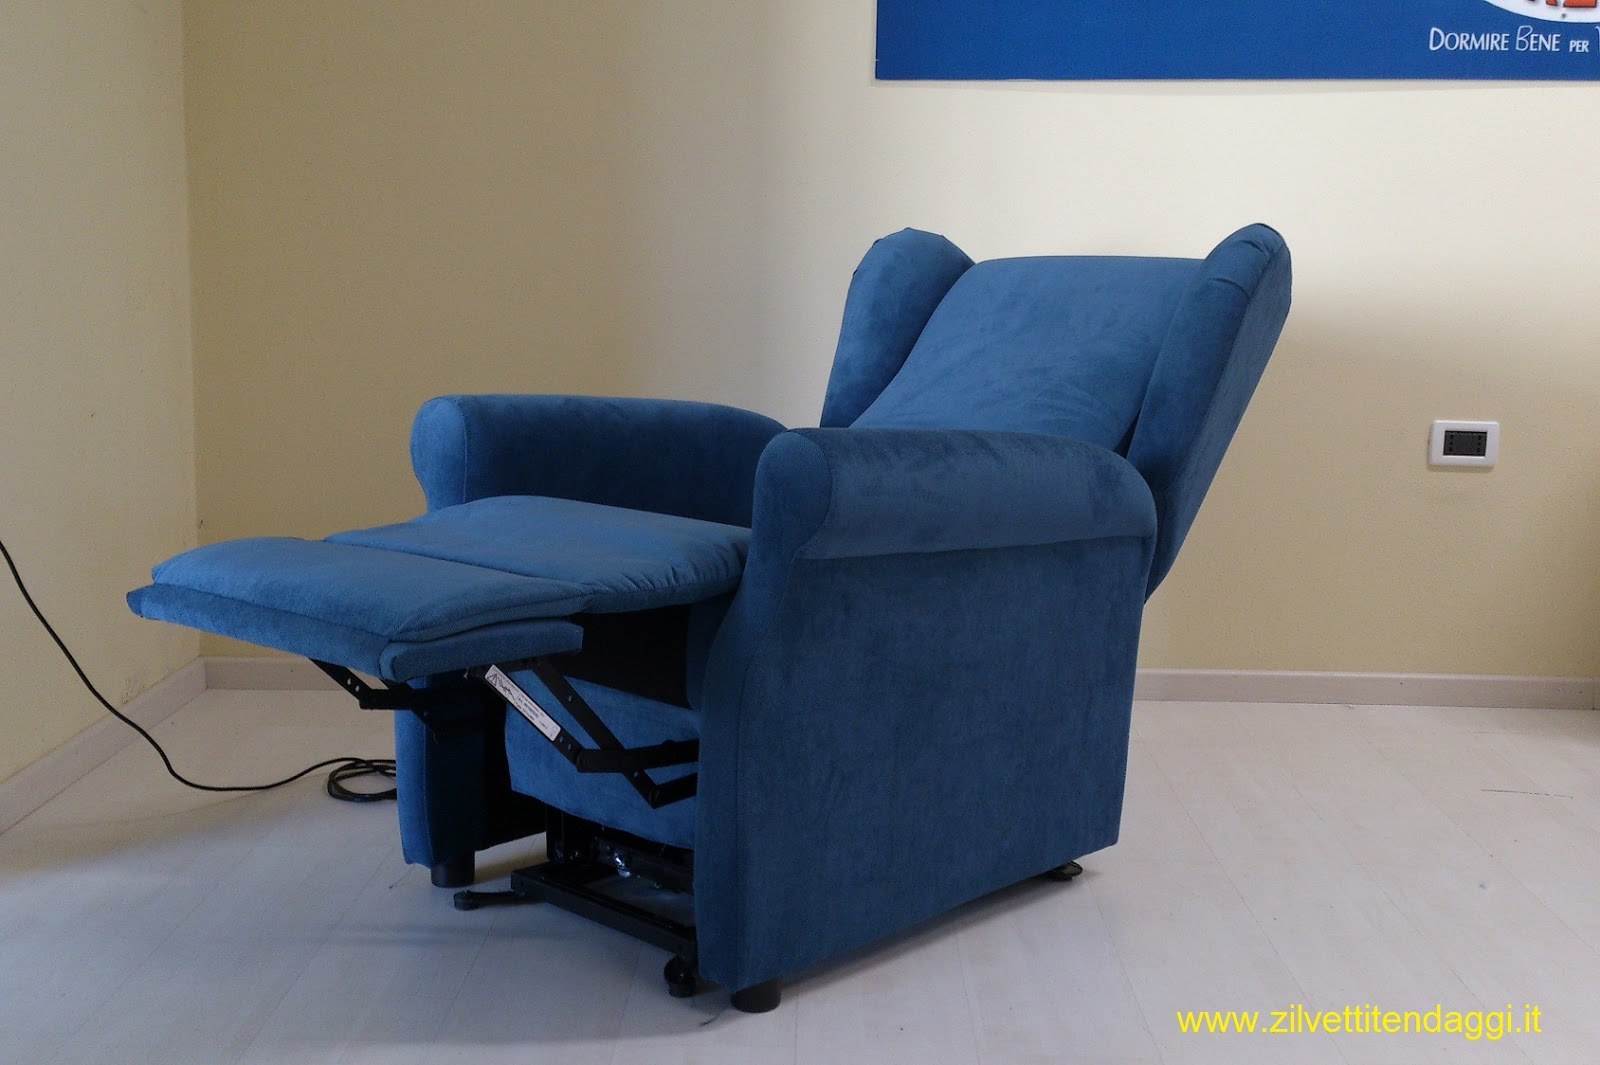 poltrona inclinabile tessuto eko 1 l ~ divani e poltrone ebay - Poltrona Relax Motorizzata Balance